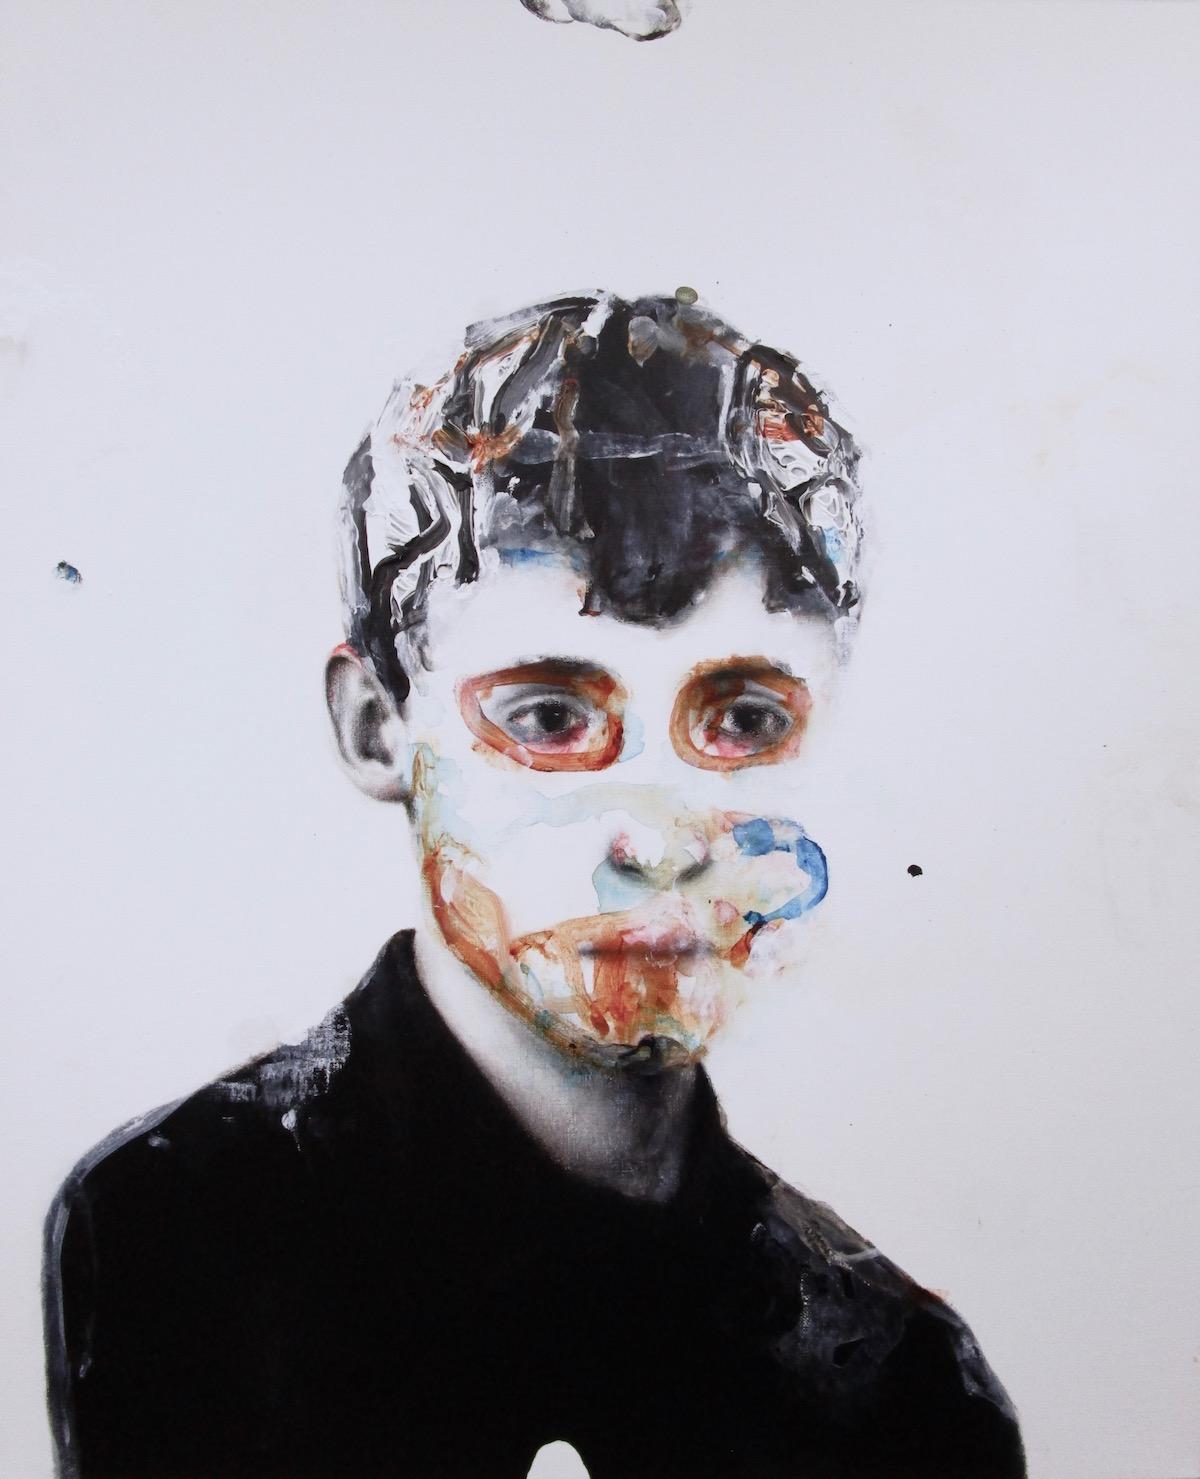 antoine cordet canvas toile peinture painting portrait art artist artiste peintre acrylic oil keep the crown in your hand